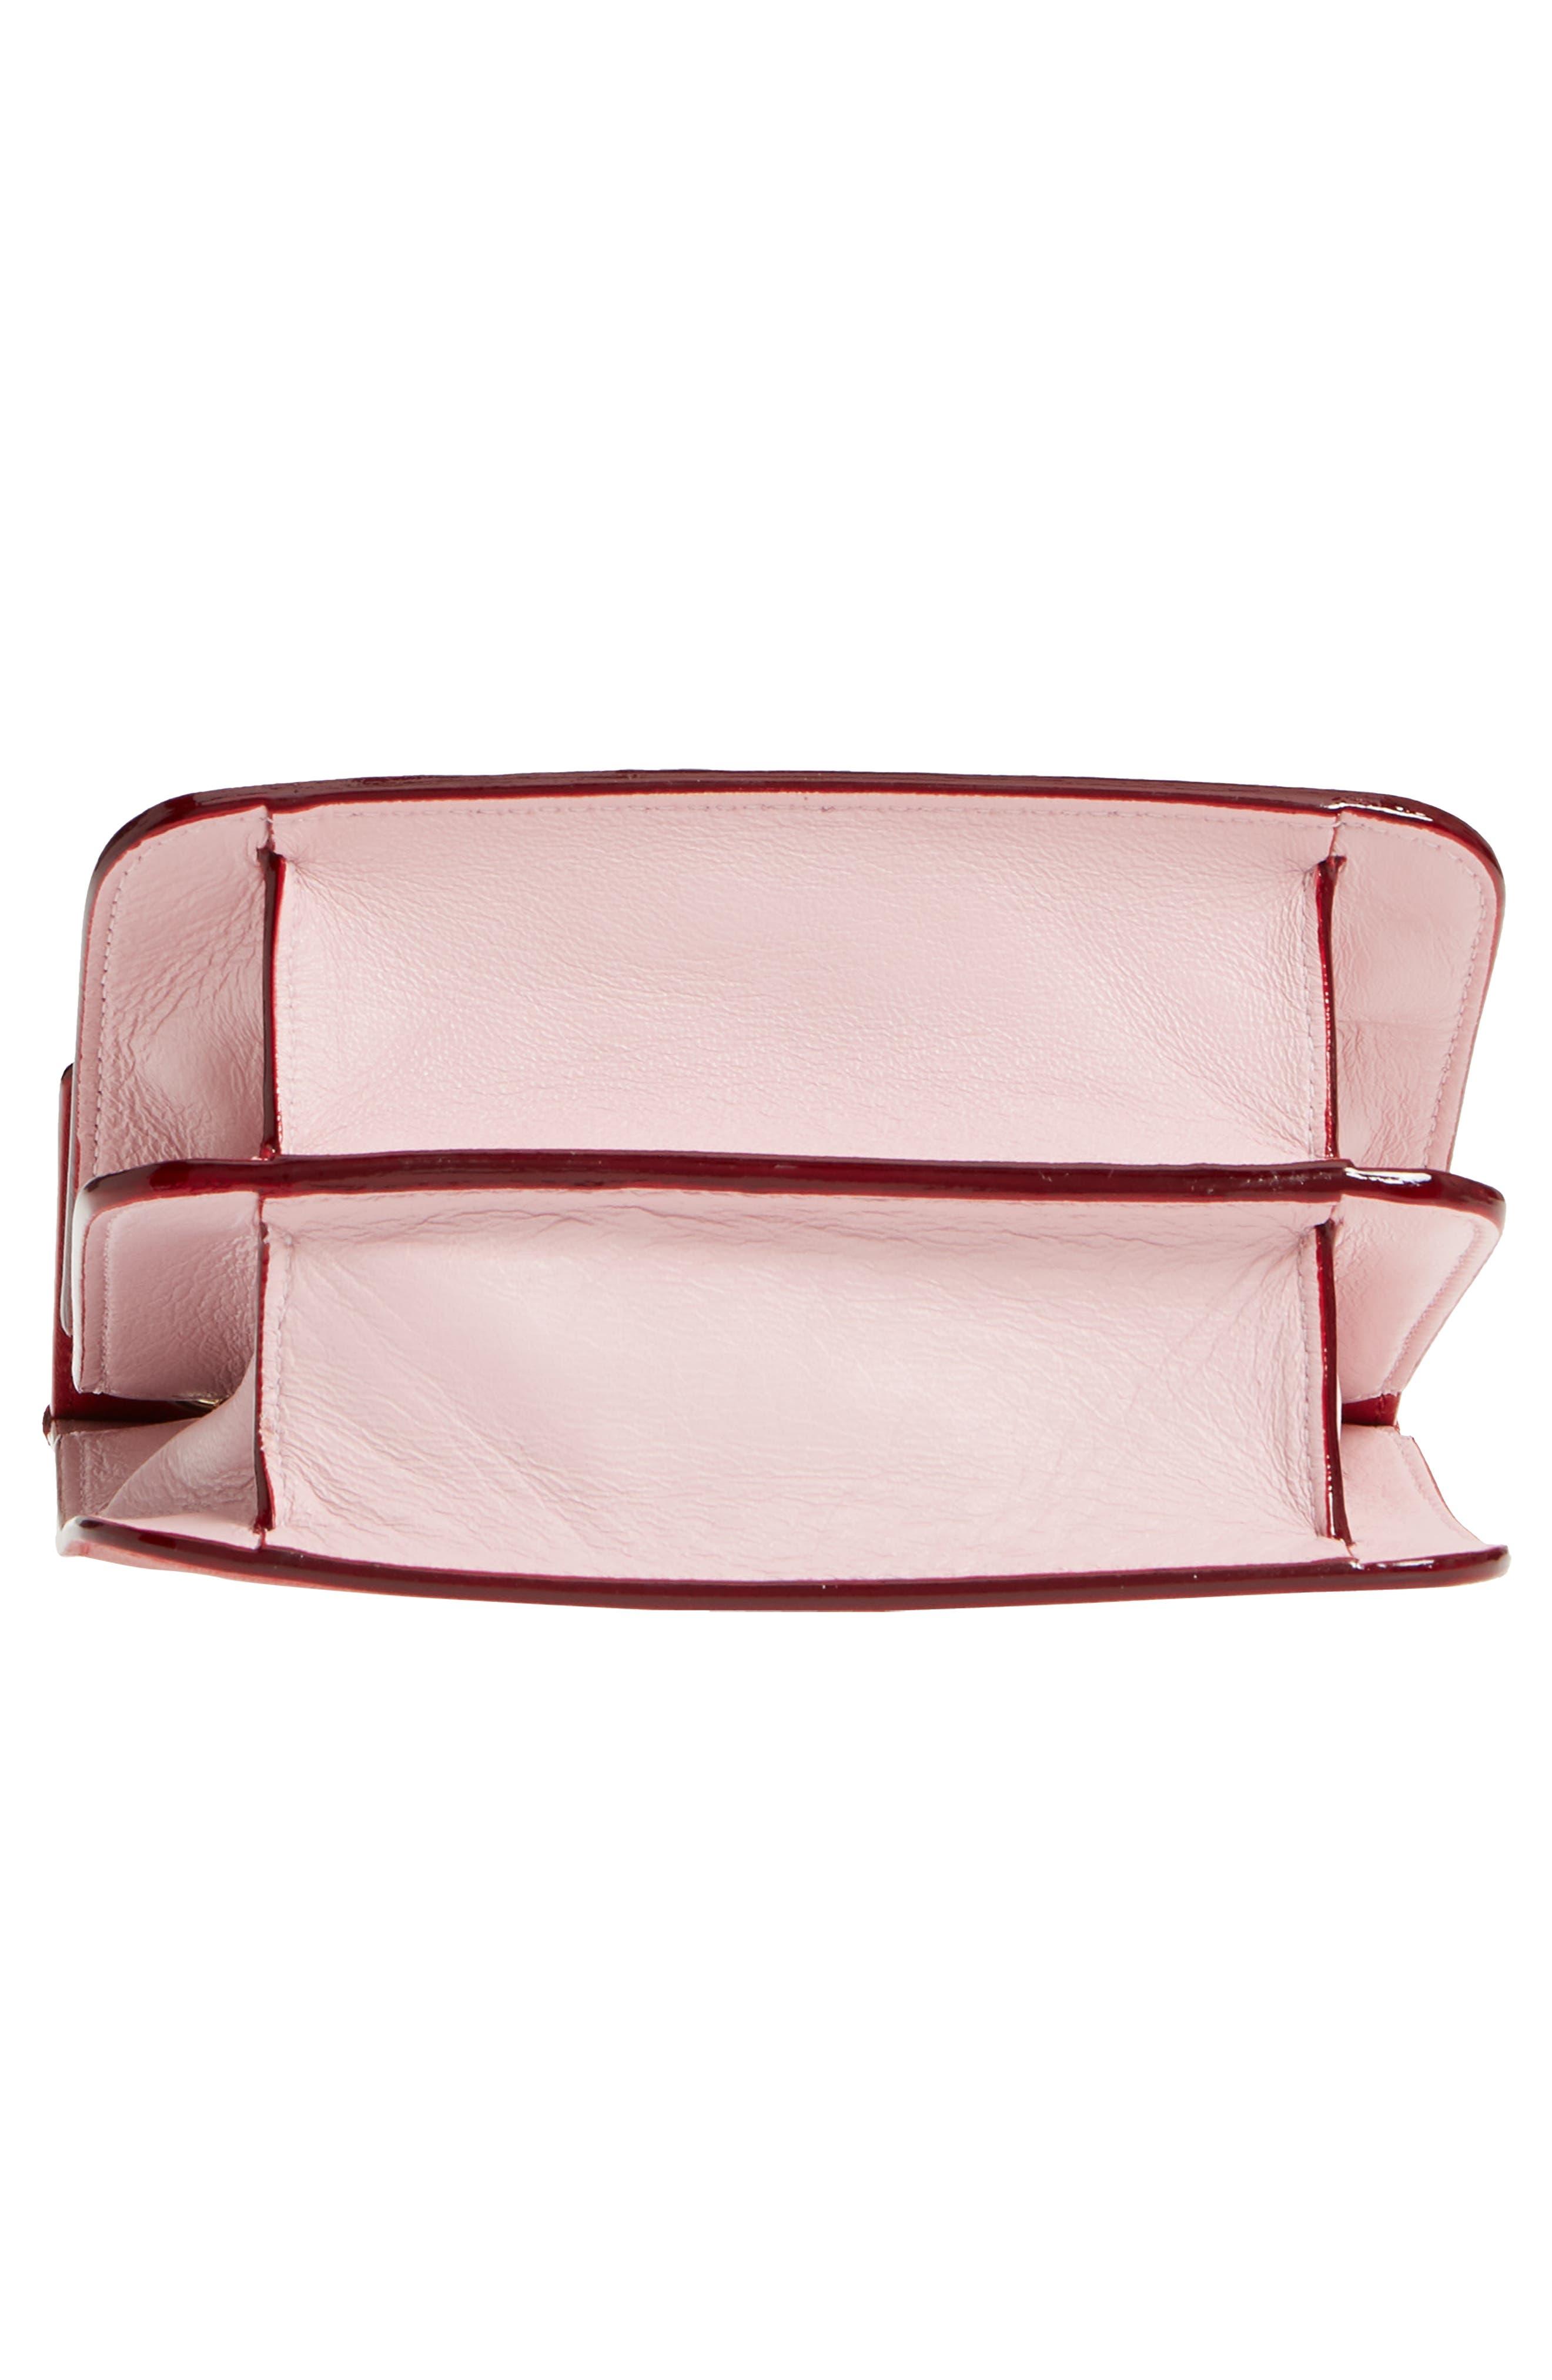 Rebel Mini Colorblock Leather Crossbody Bag,                             Alternate thumbnail 6, color,                             600